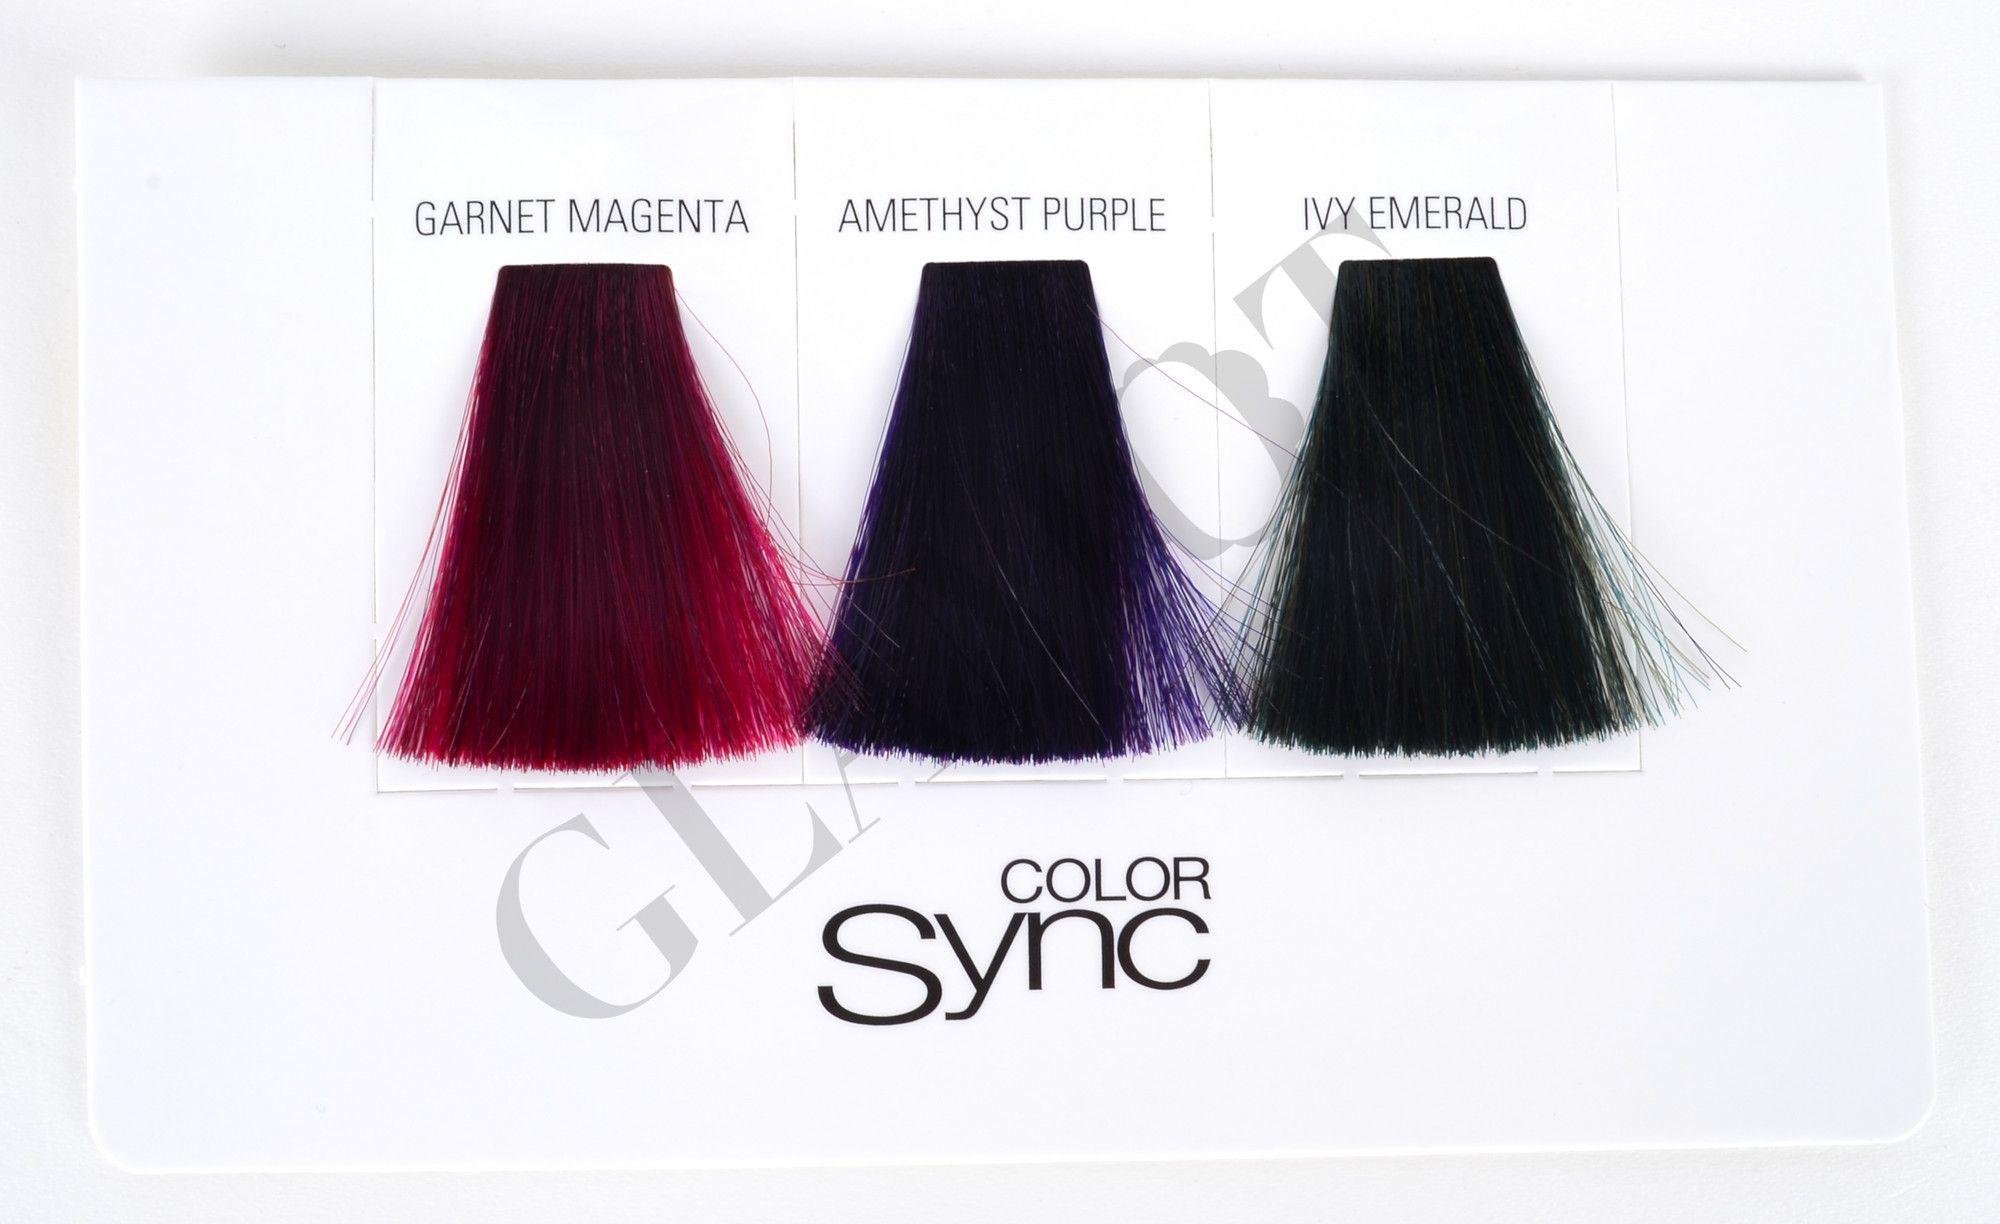 Bright Matrix Shade Card Matrix Hair Dye Color Chart In 2020 Hair Dye Color Chart Hair Dye Colors Matrix Hair